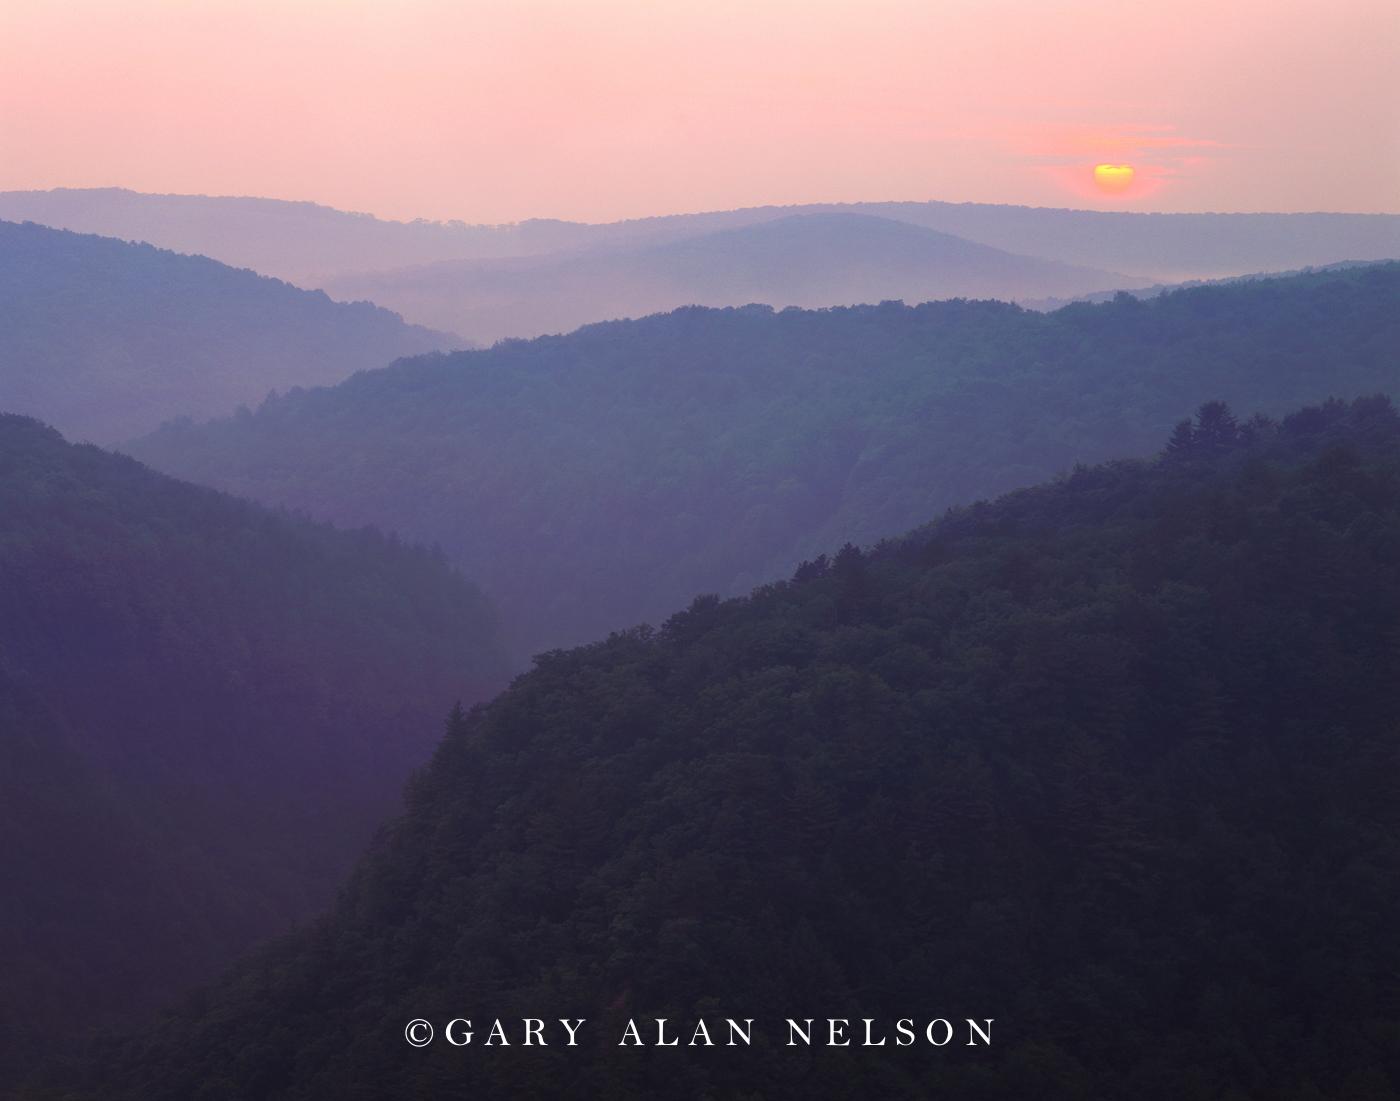 pennsylvania, hog backs, setting sun, state park, photo